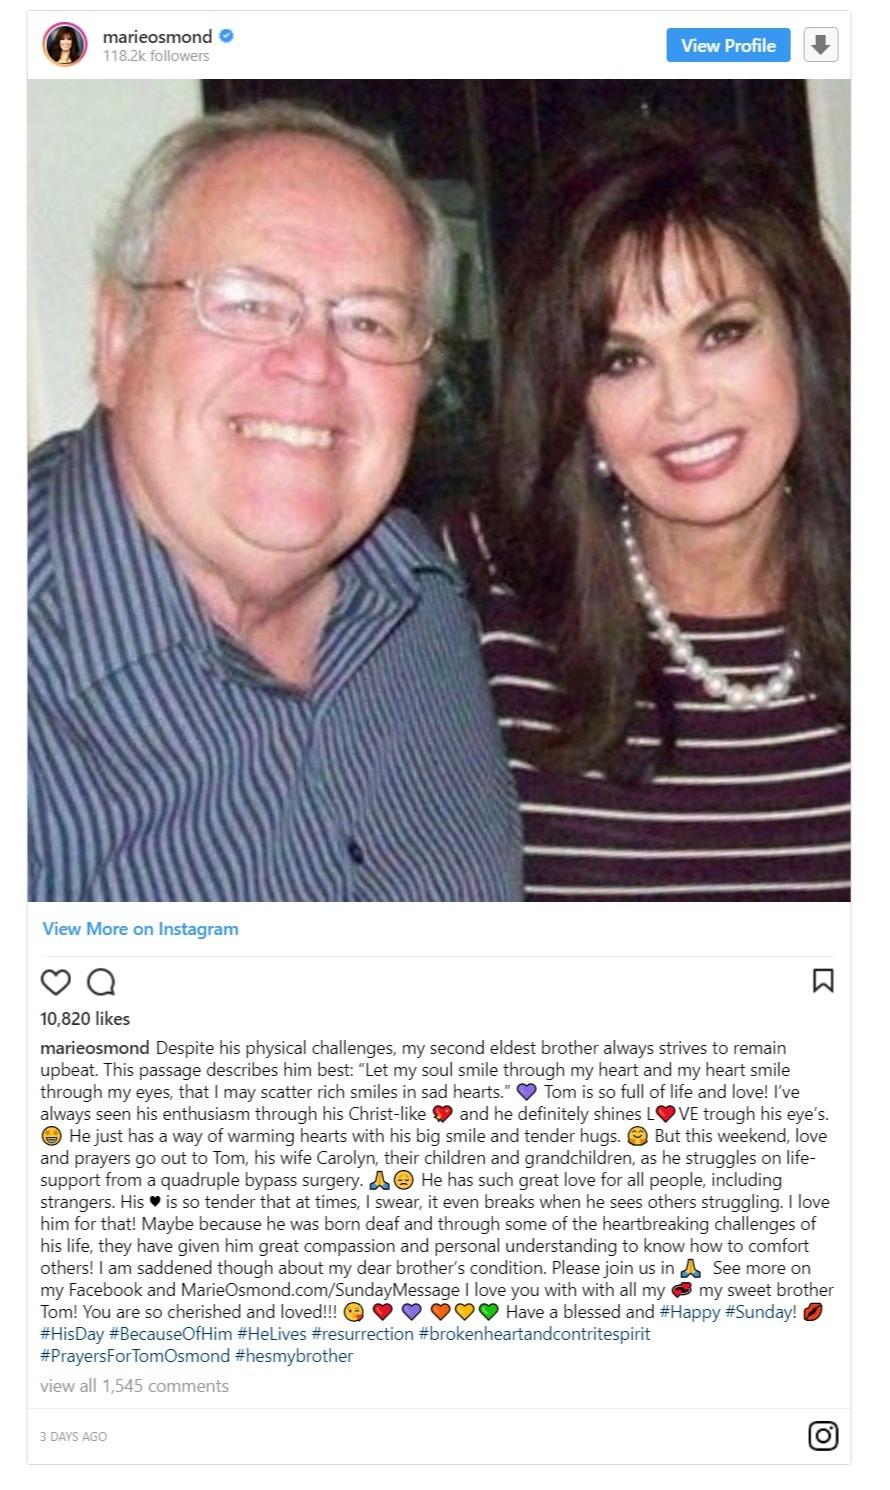 Marie Osmond's Instagram post regarding her brother, Tom Osmond's health condition